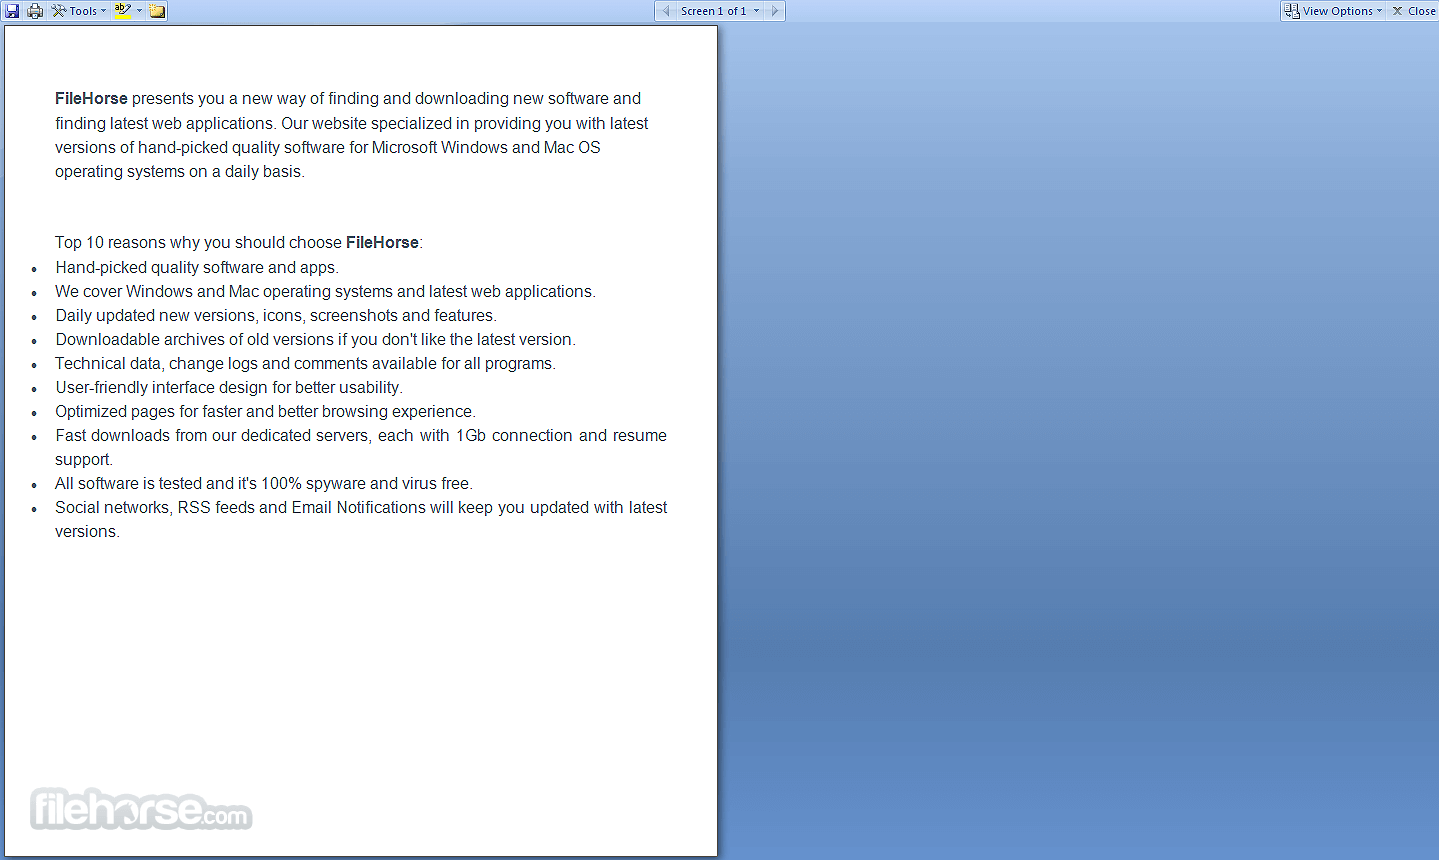 WordMate 1.0.1.48 Screenshot 2